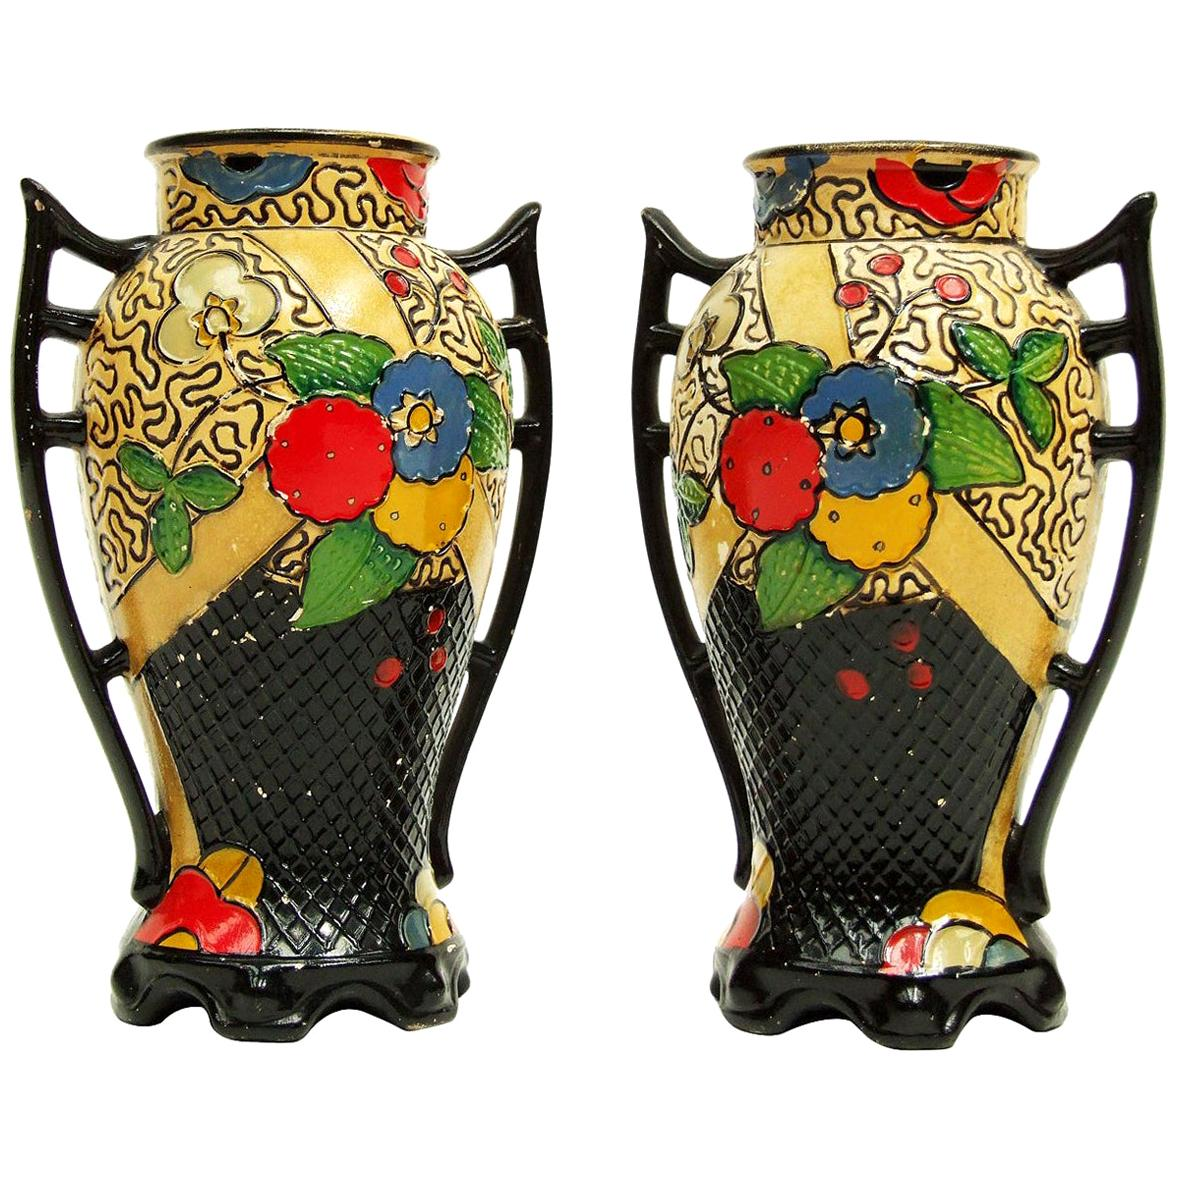 1920s Art Deco Oriental Hand Painted Ceramic Embosa Vases